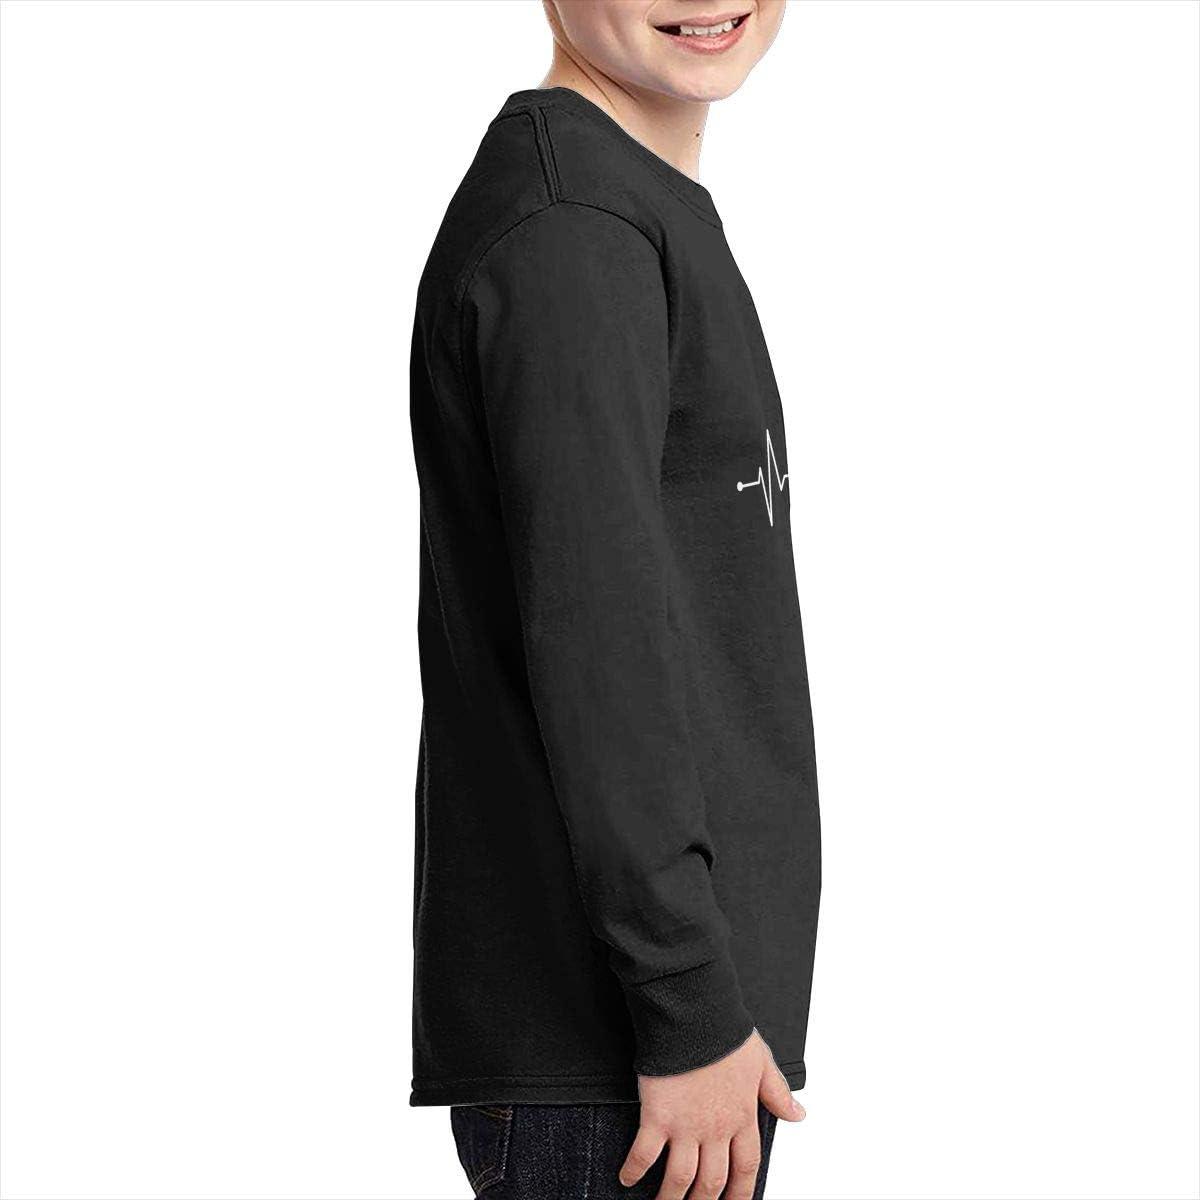 ZHAN-pcc Boys BMX Heartbeat Fashion Long Sleeve Crewneck T-Shirt Top Black